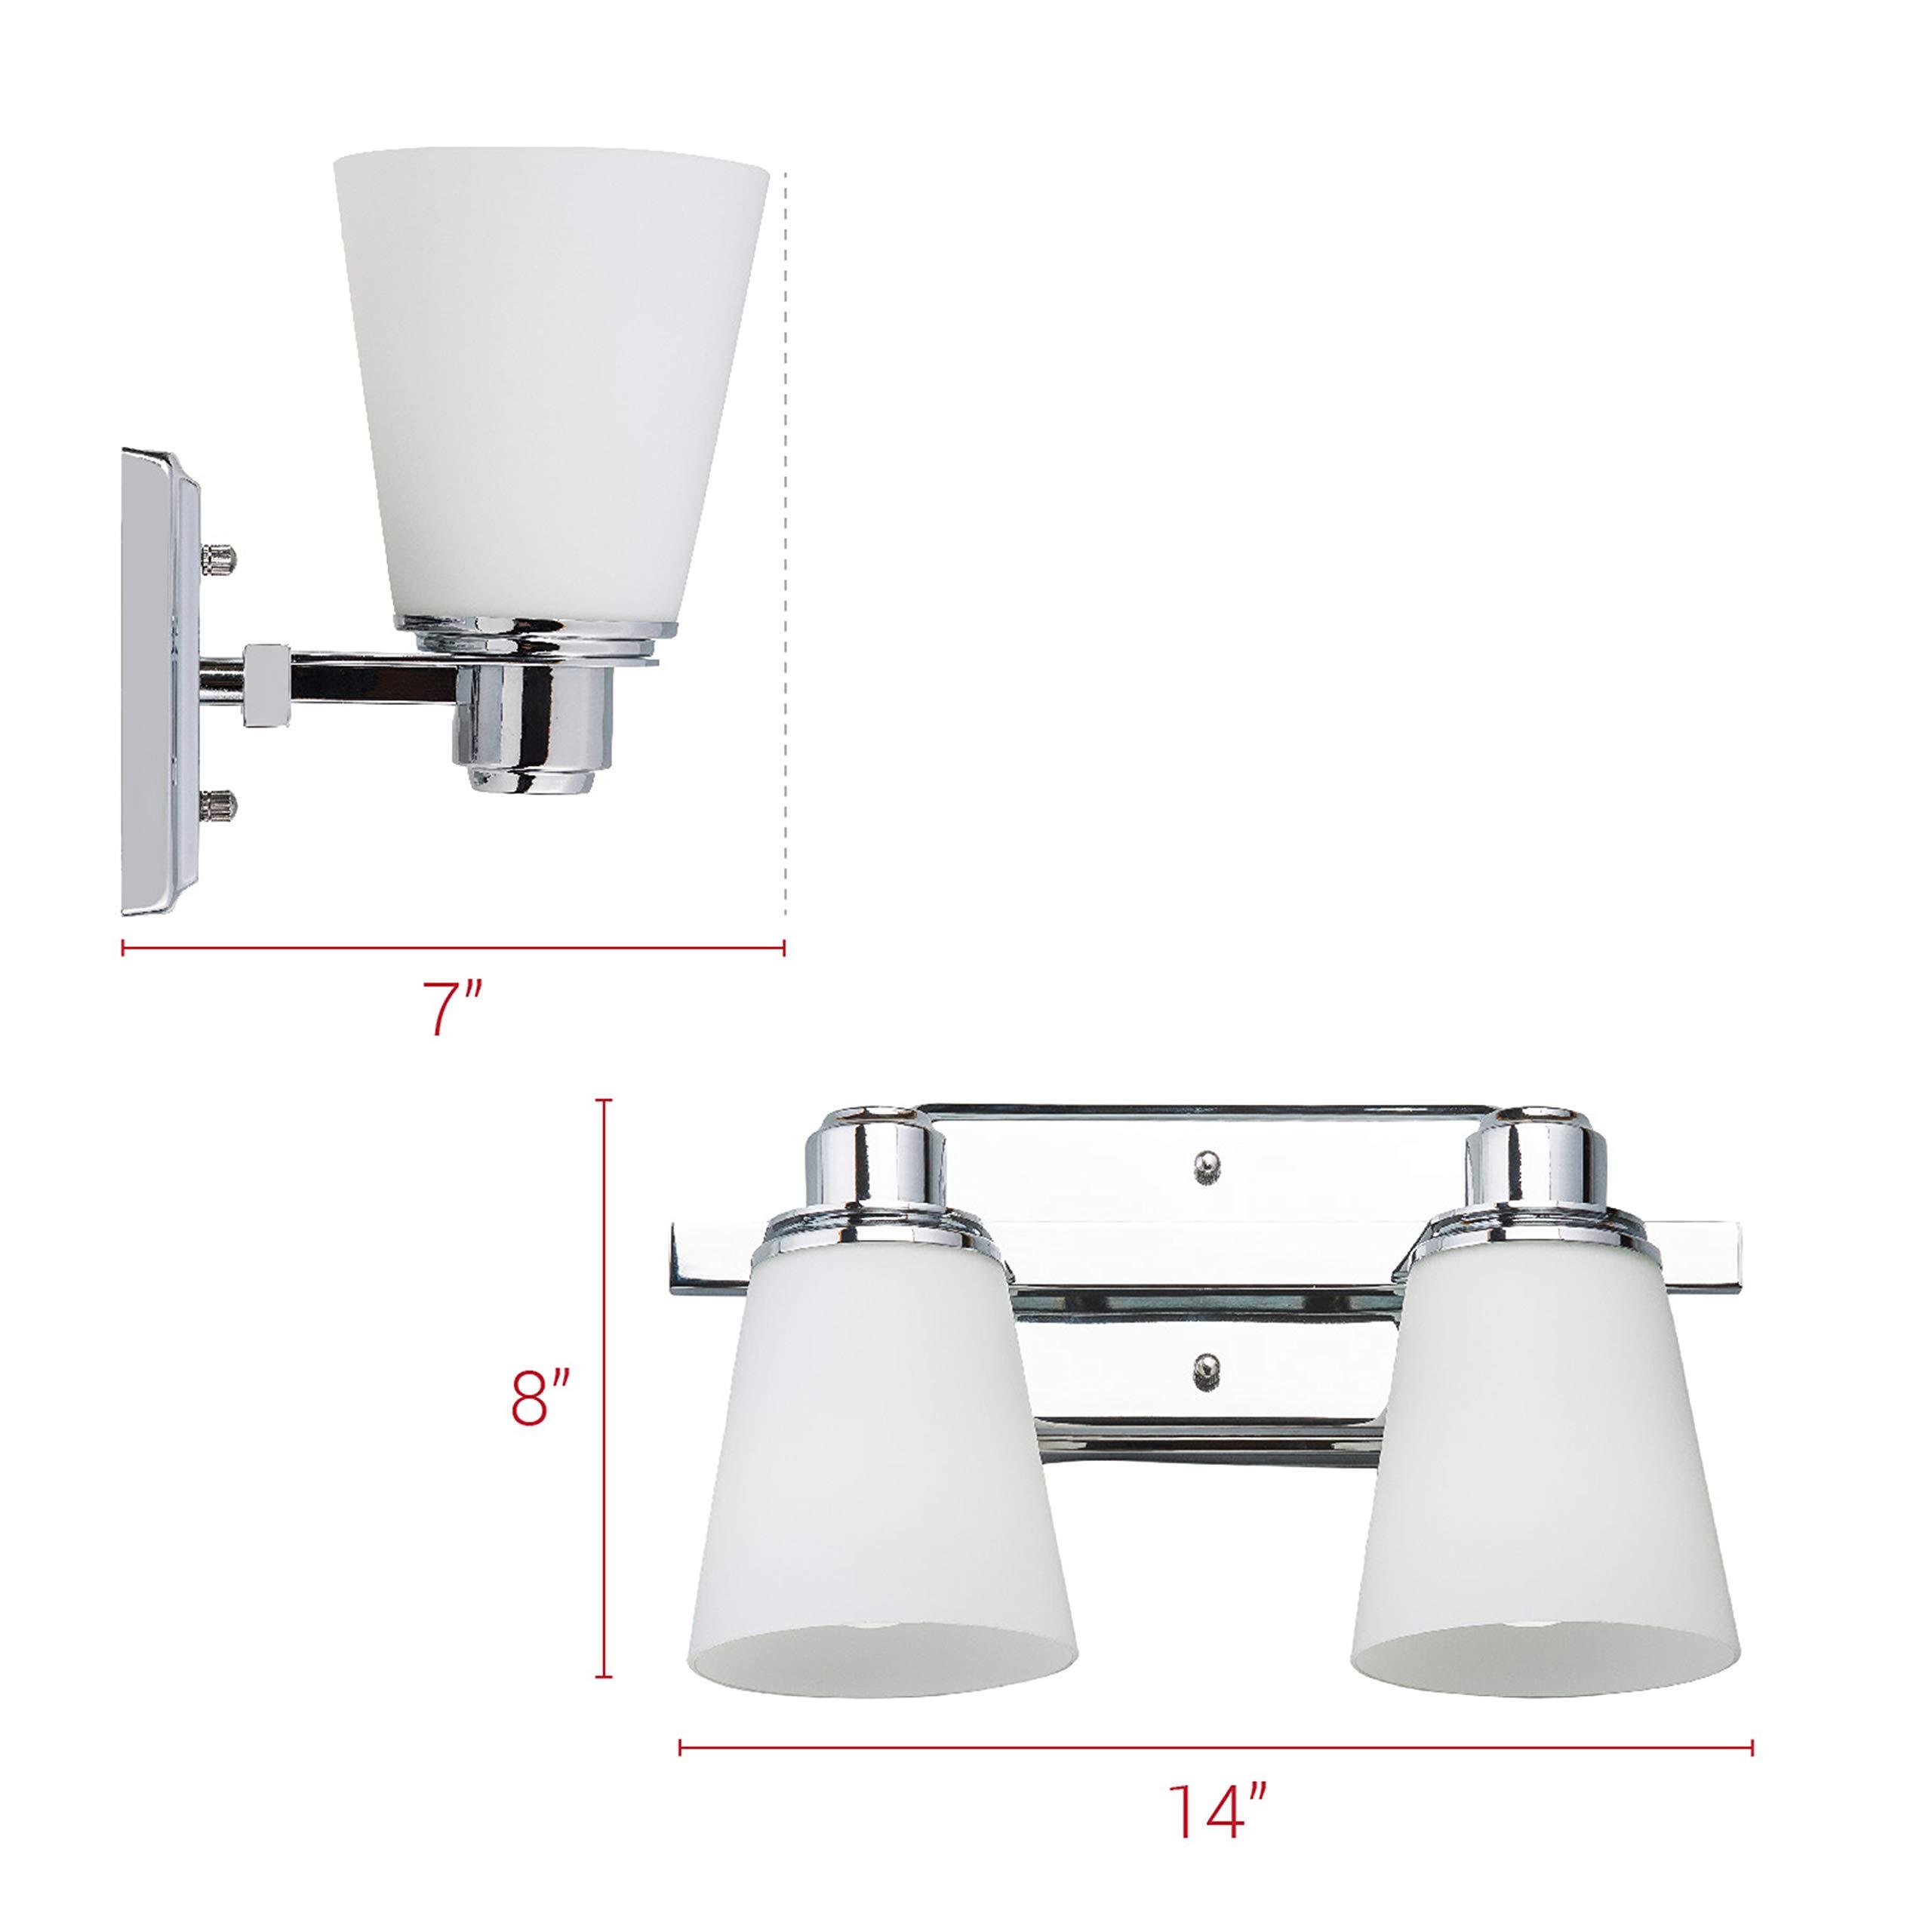 Terracina Two-Light Vanity Sconce Lamp, Polished Chrome with Opal Glass Linea di Liara LL-WL220-2 by Linea di Liara (Image #3)